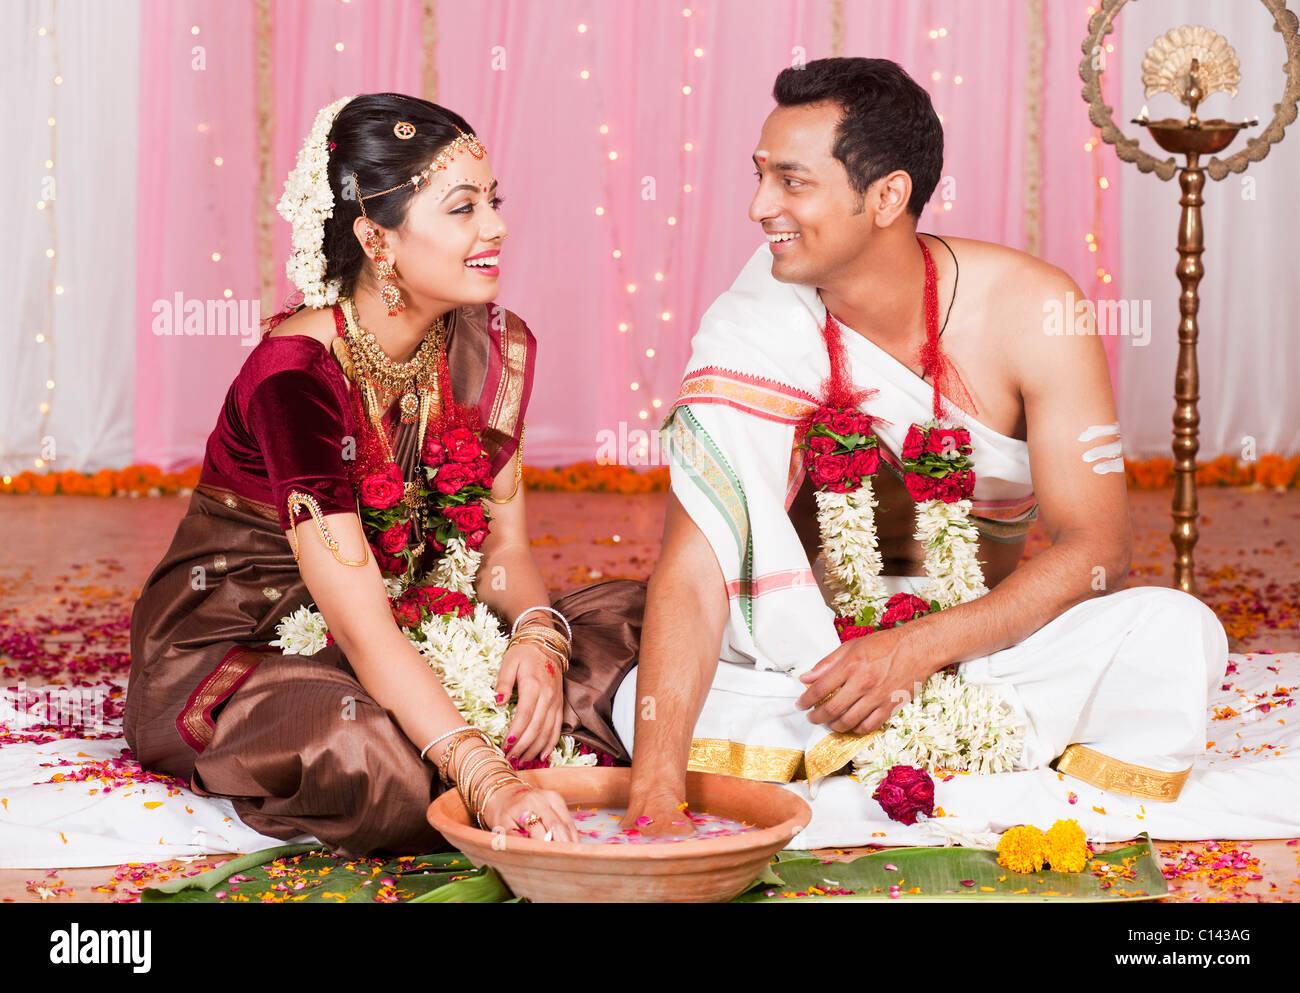 Newlywed Couple Playing Kangana Jua During South Indian Wedding Ceremony